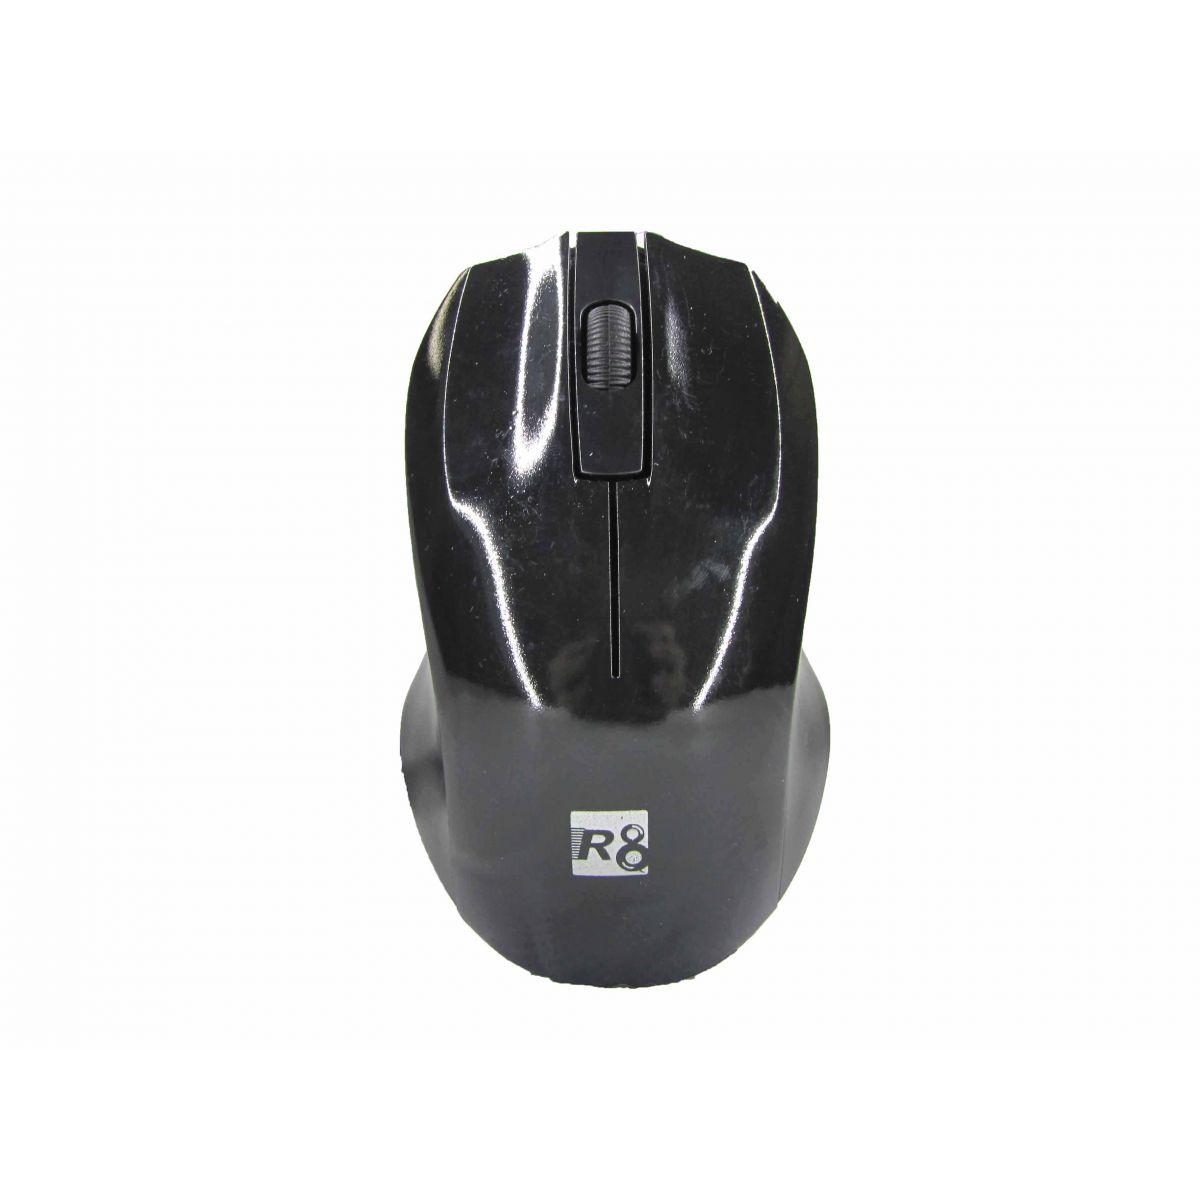 Mouse Optico 3D 1000DPI USB PRETO R8